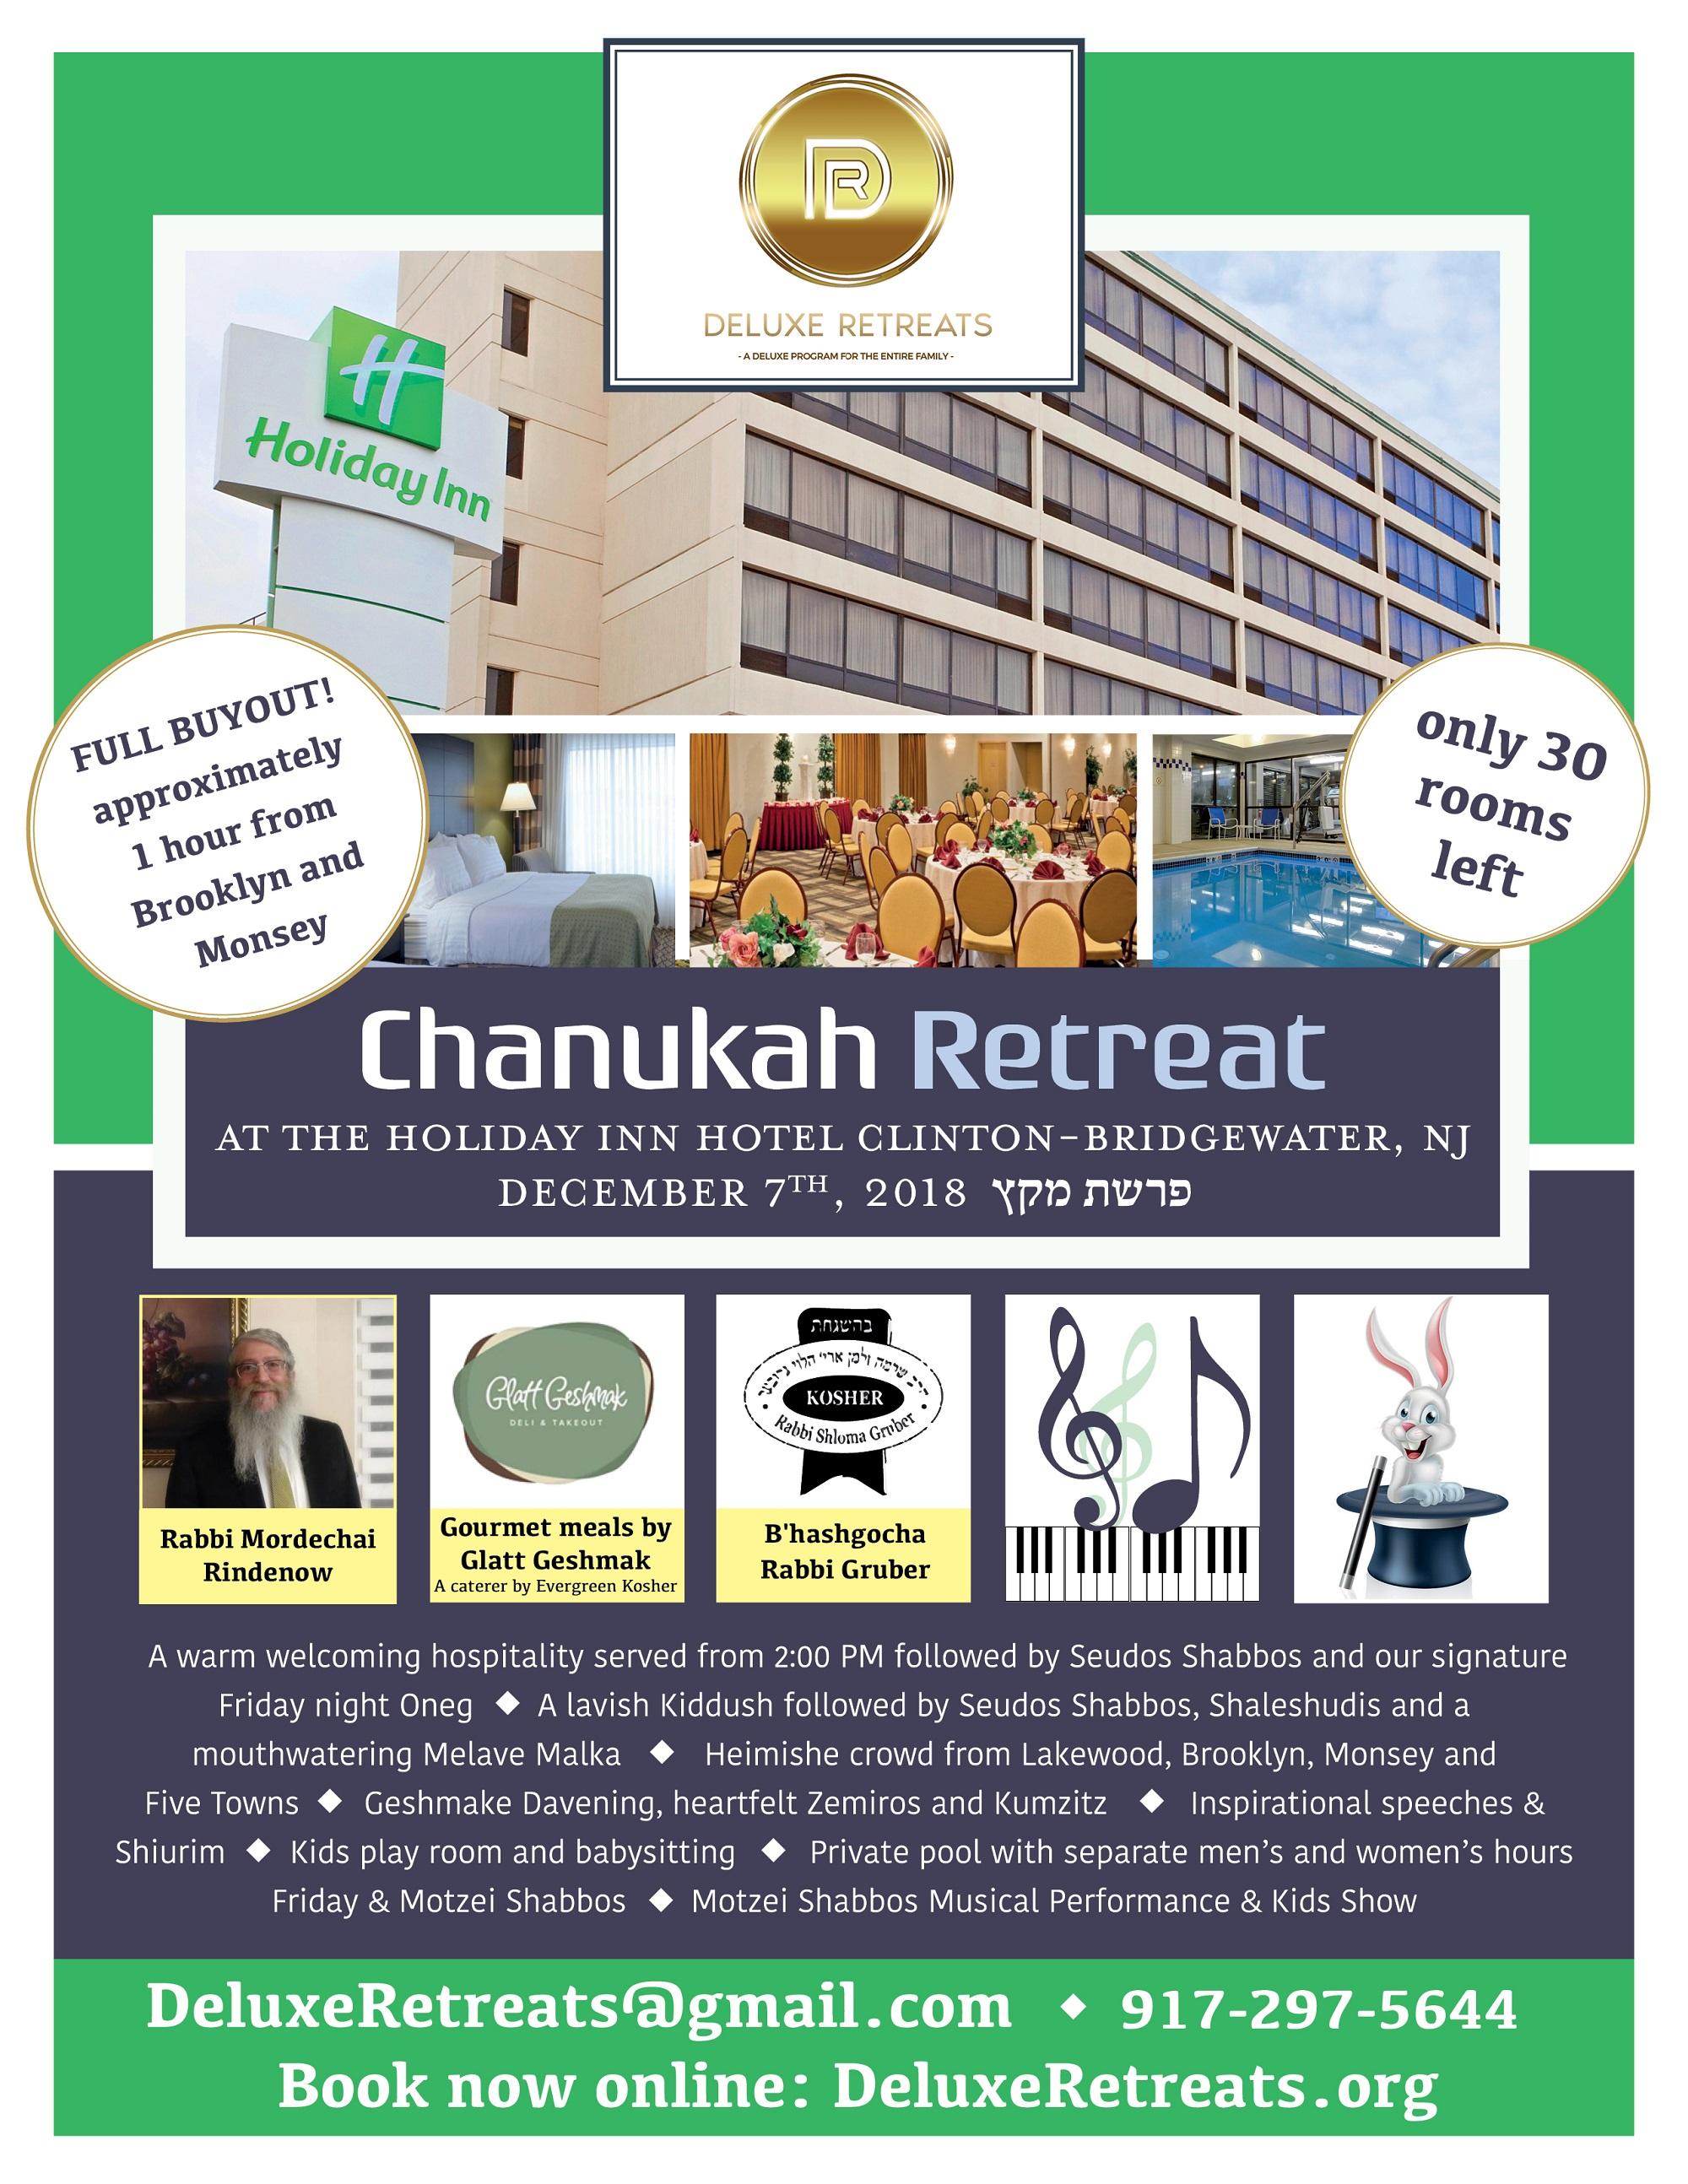 2018 Chanukah Getaway